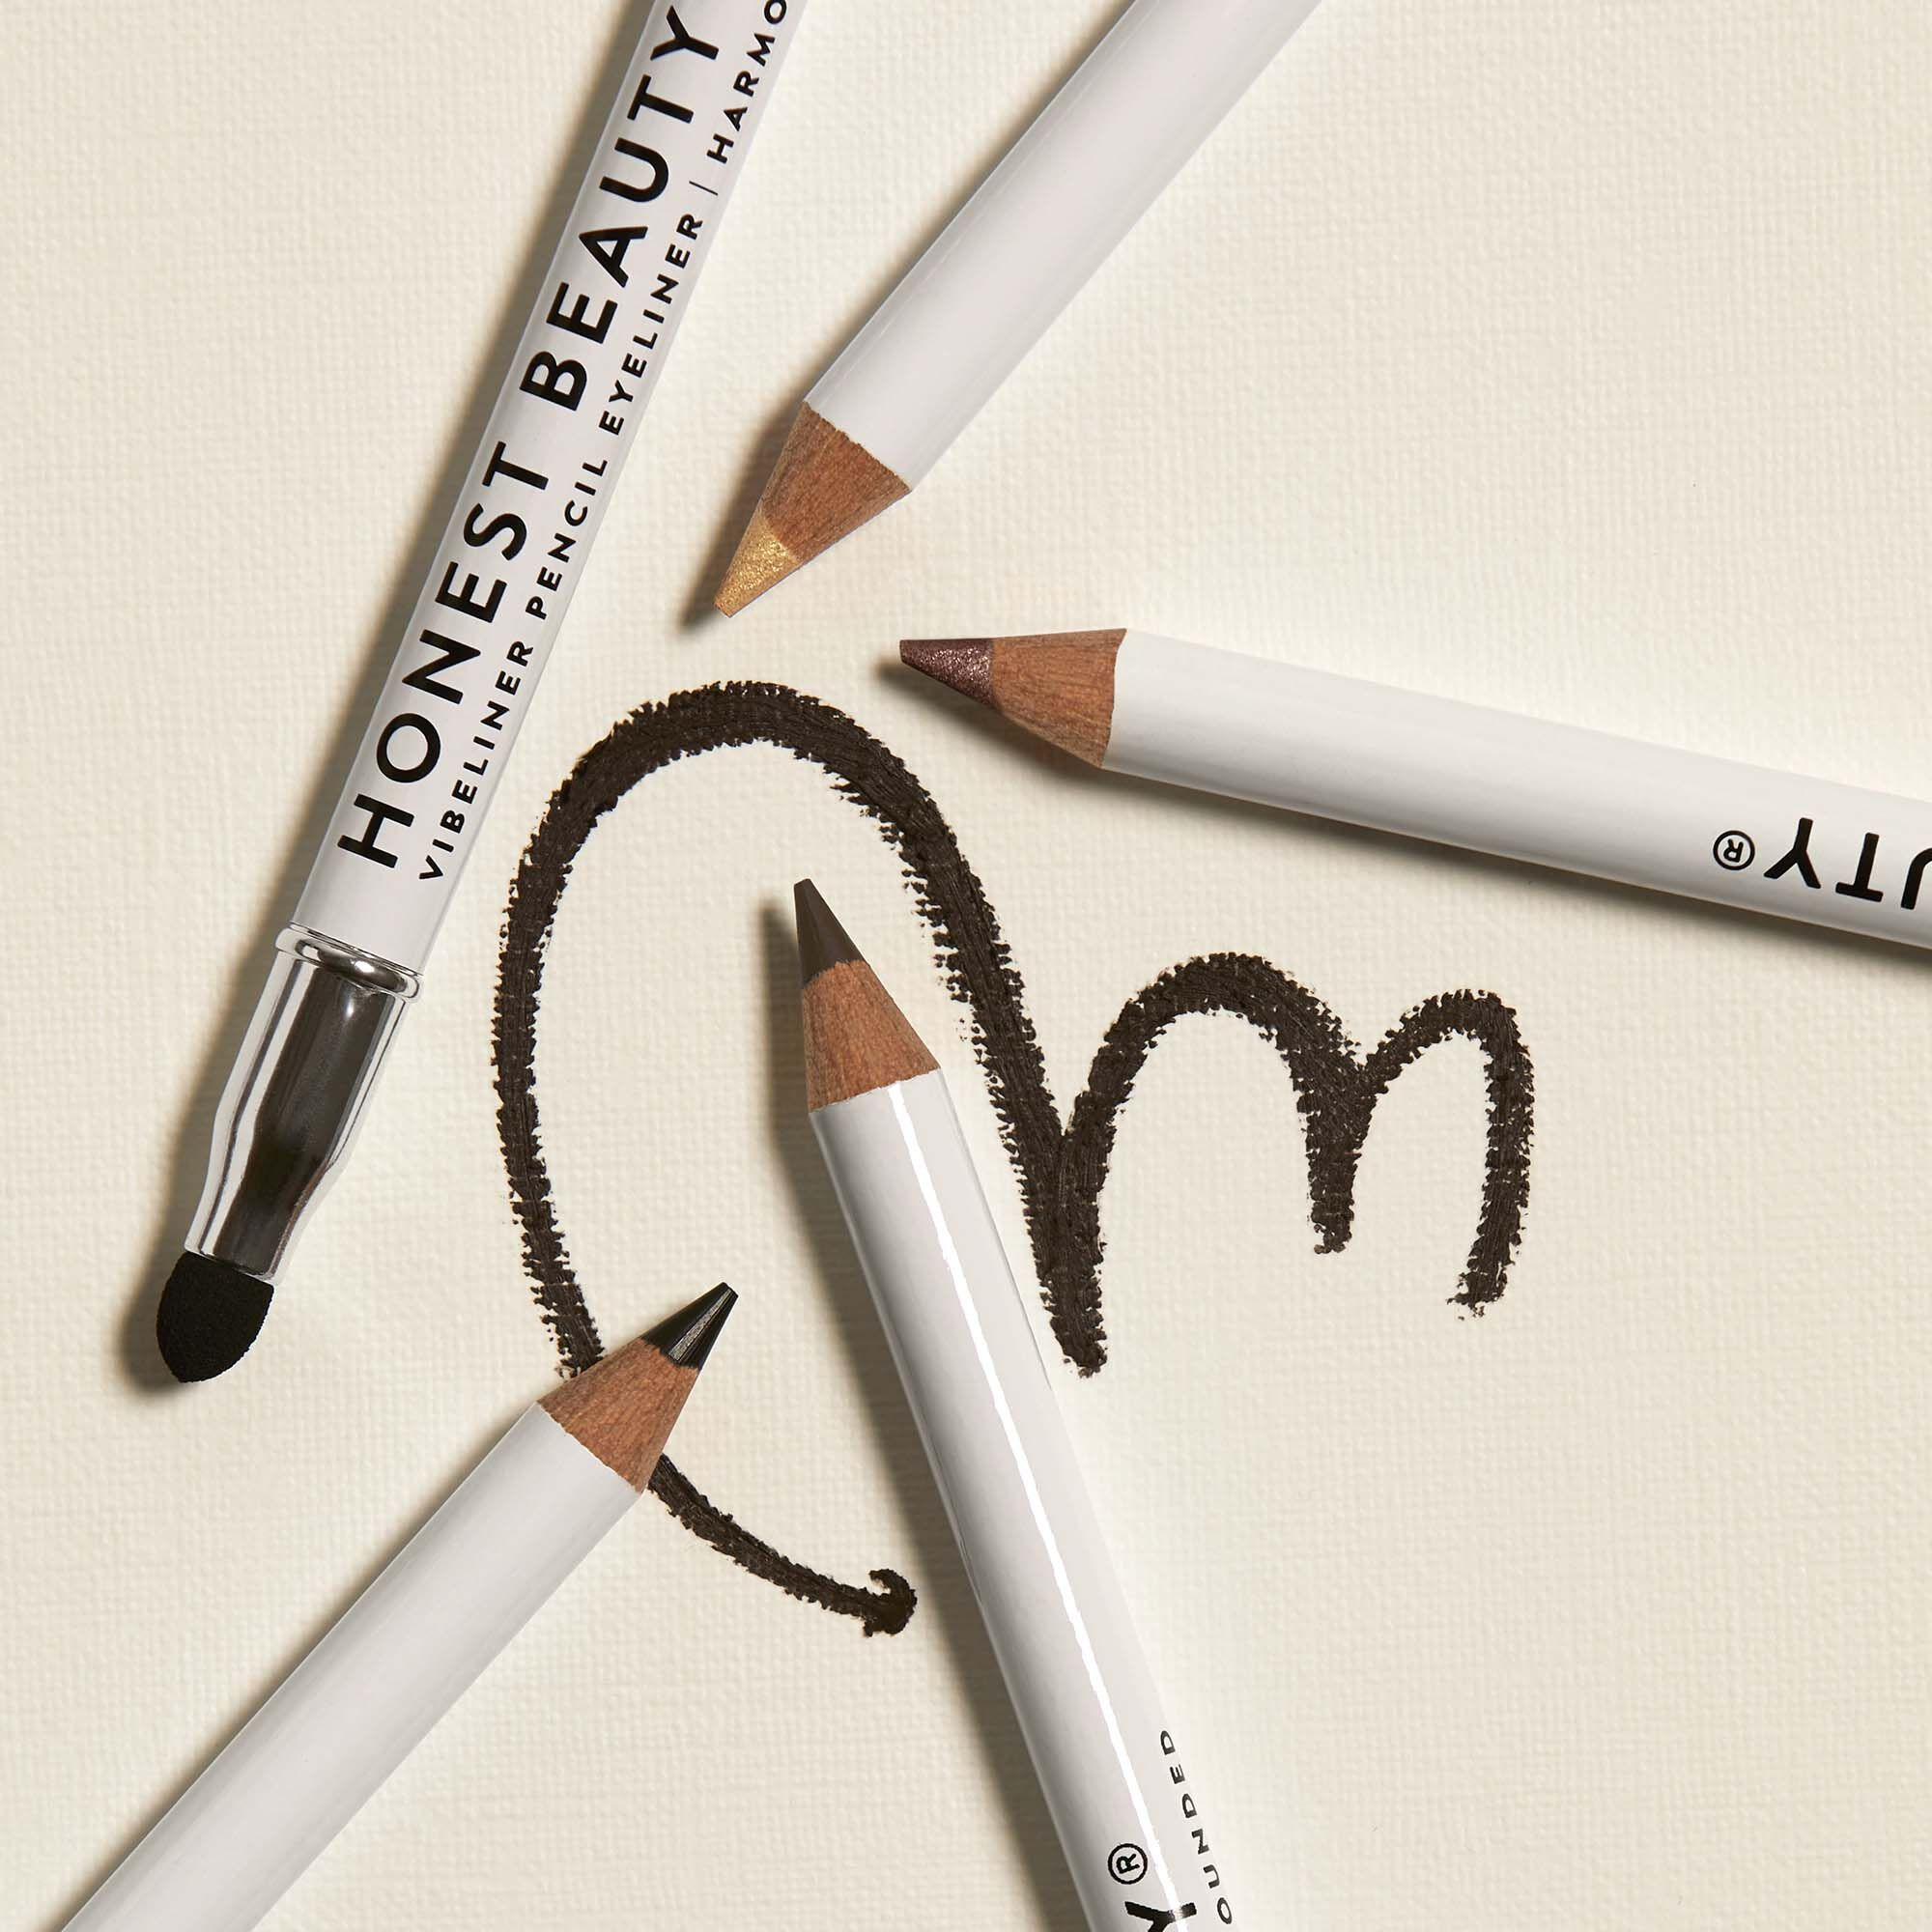 Vibeliner Pencil Eyeliner